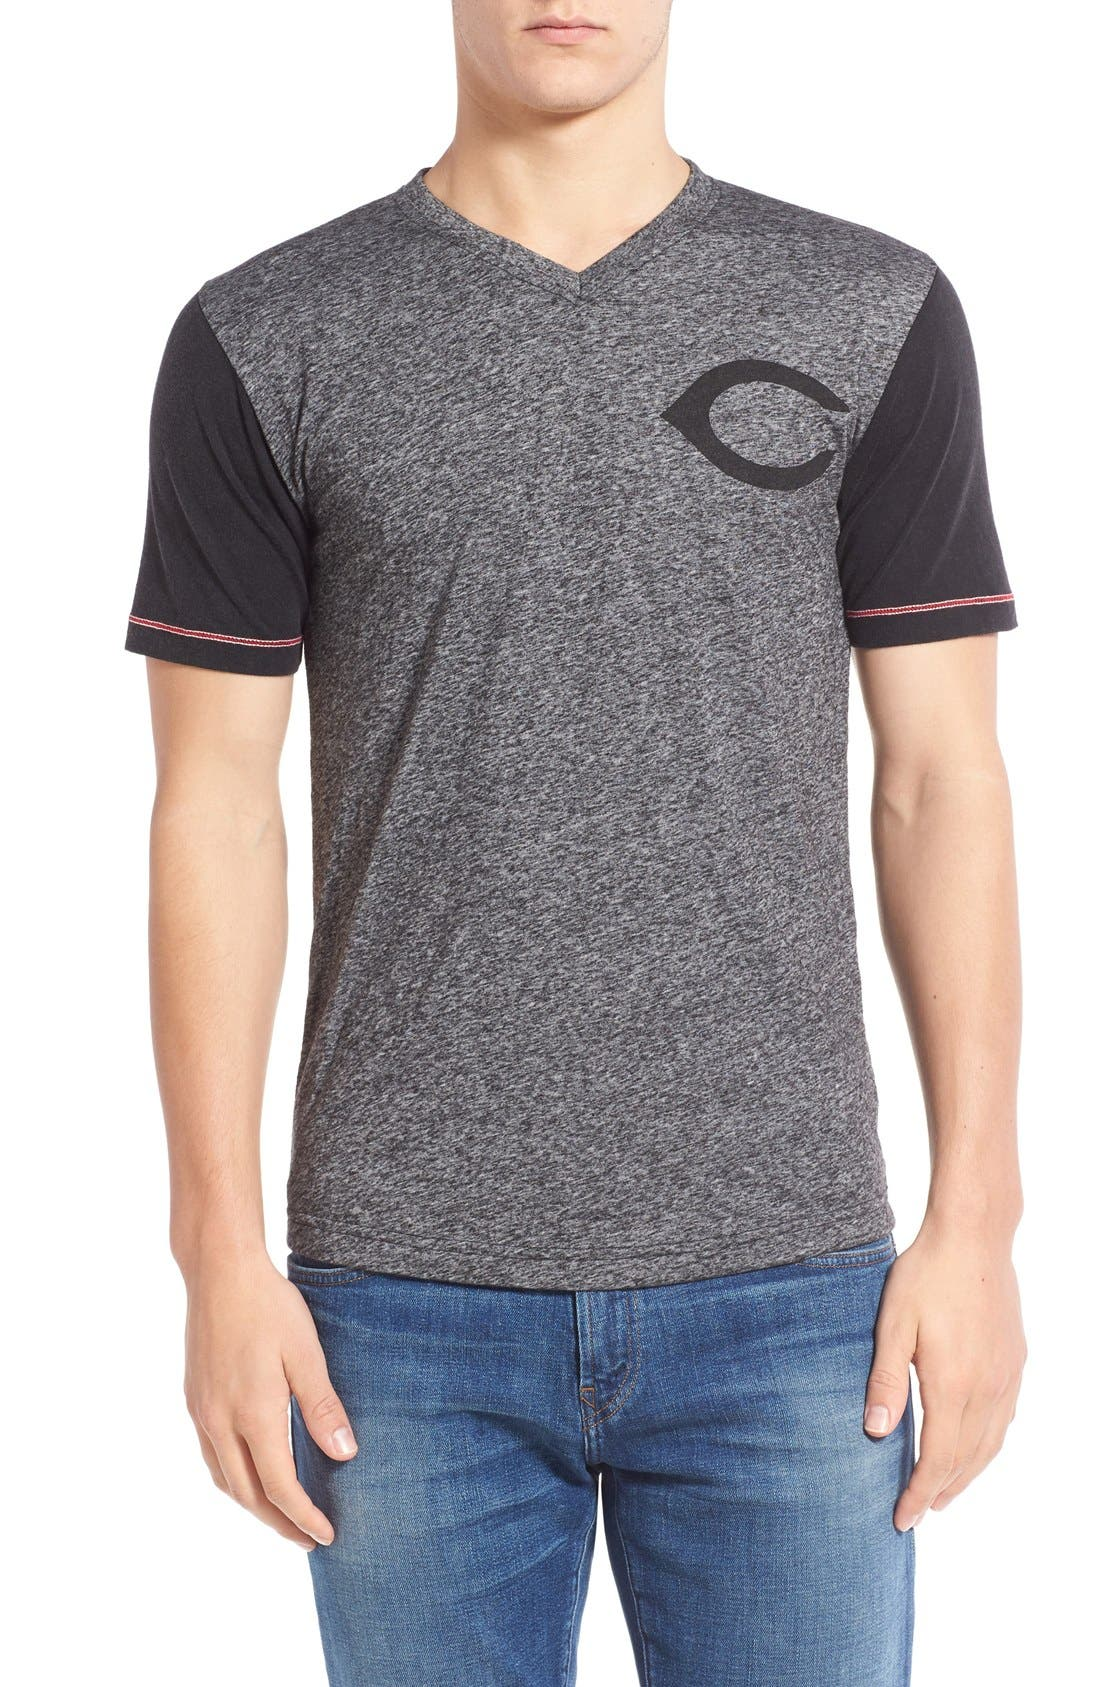 Red Jacket 'Cincinnati Reds - Onyx' Trim Fit V-Neck T-Shirt